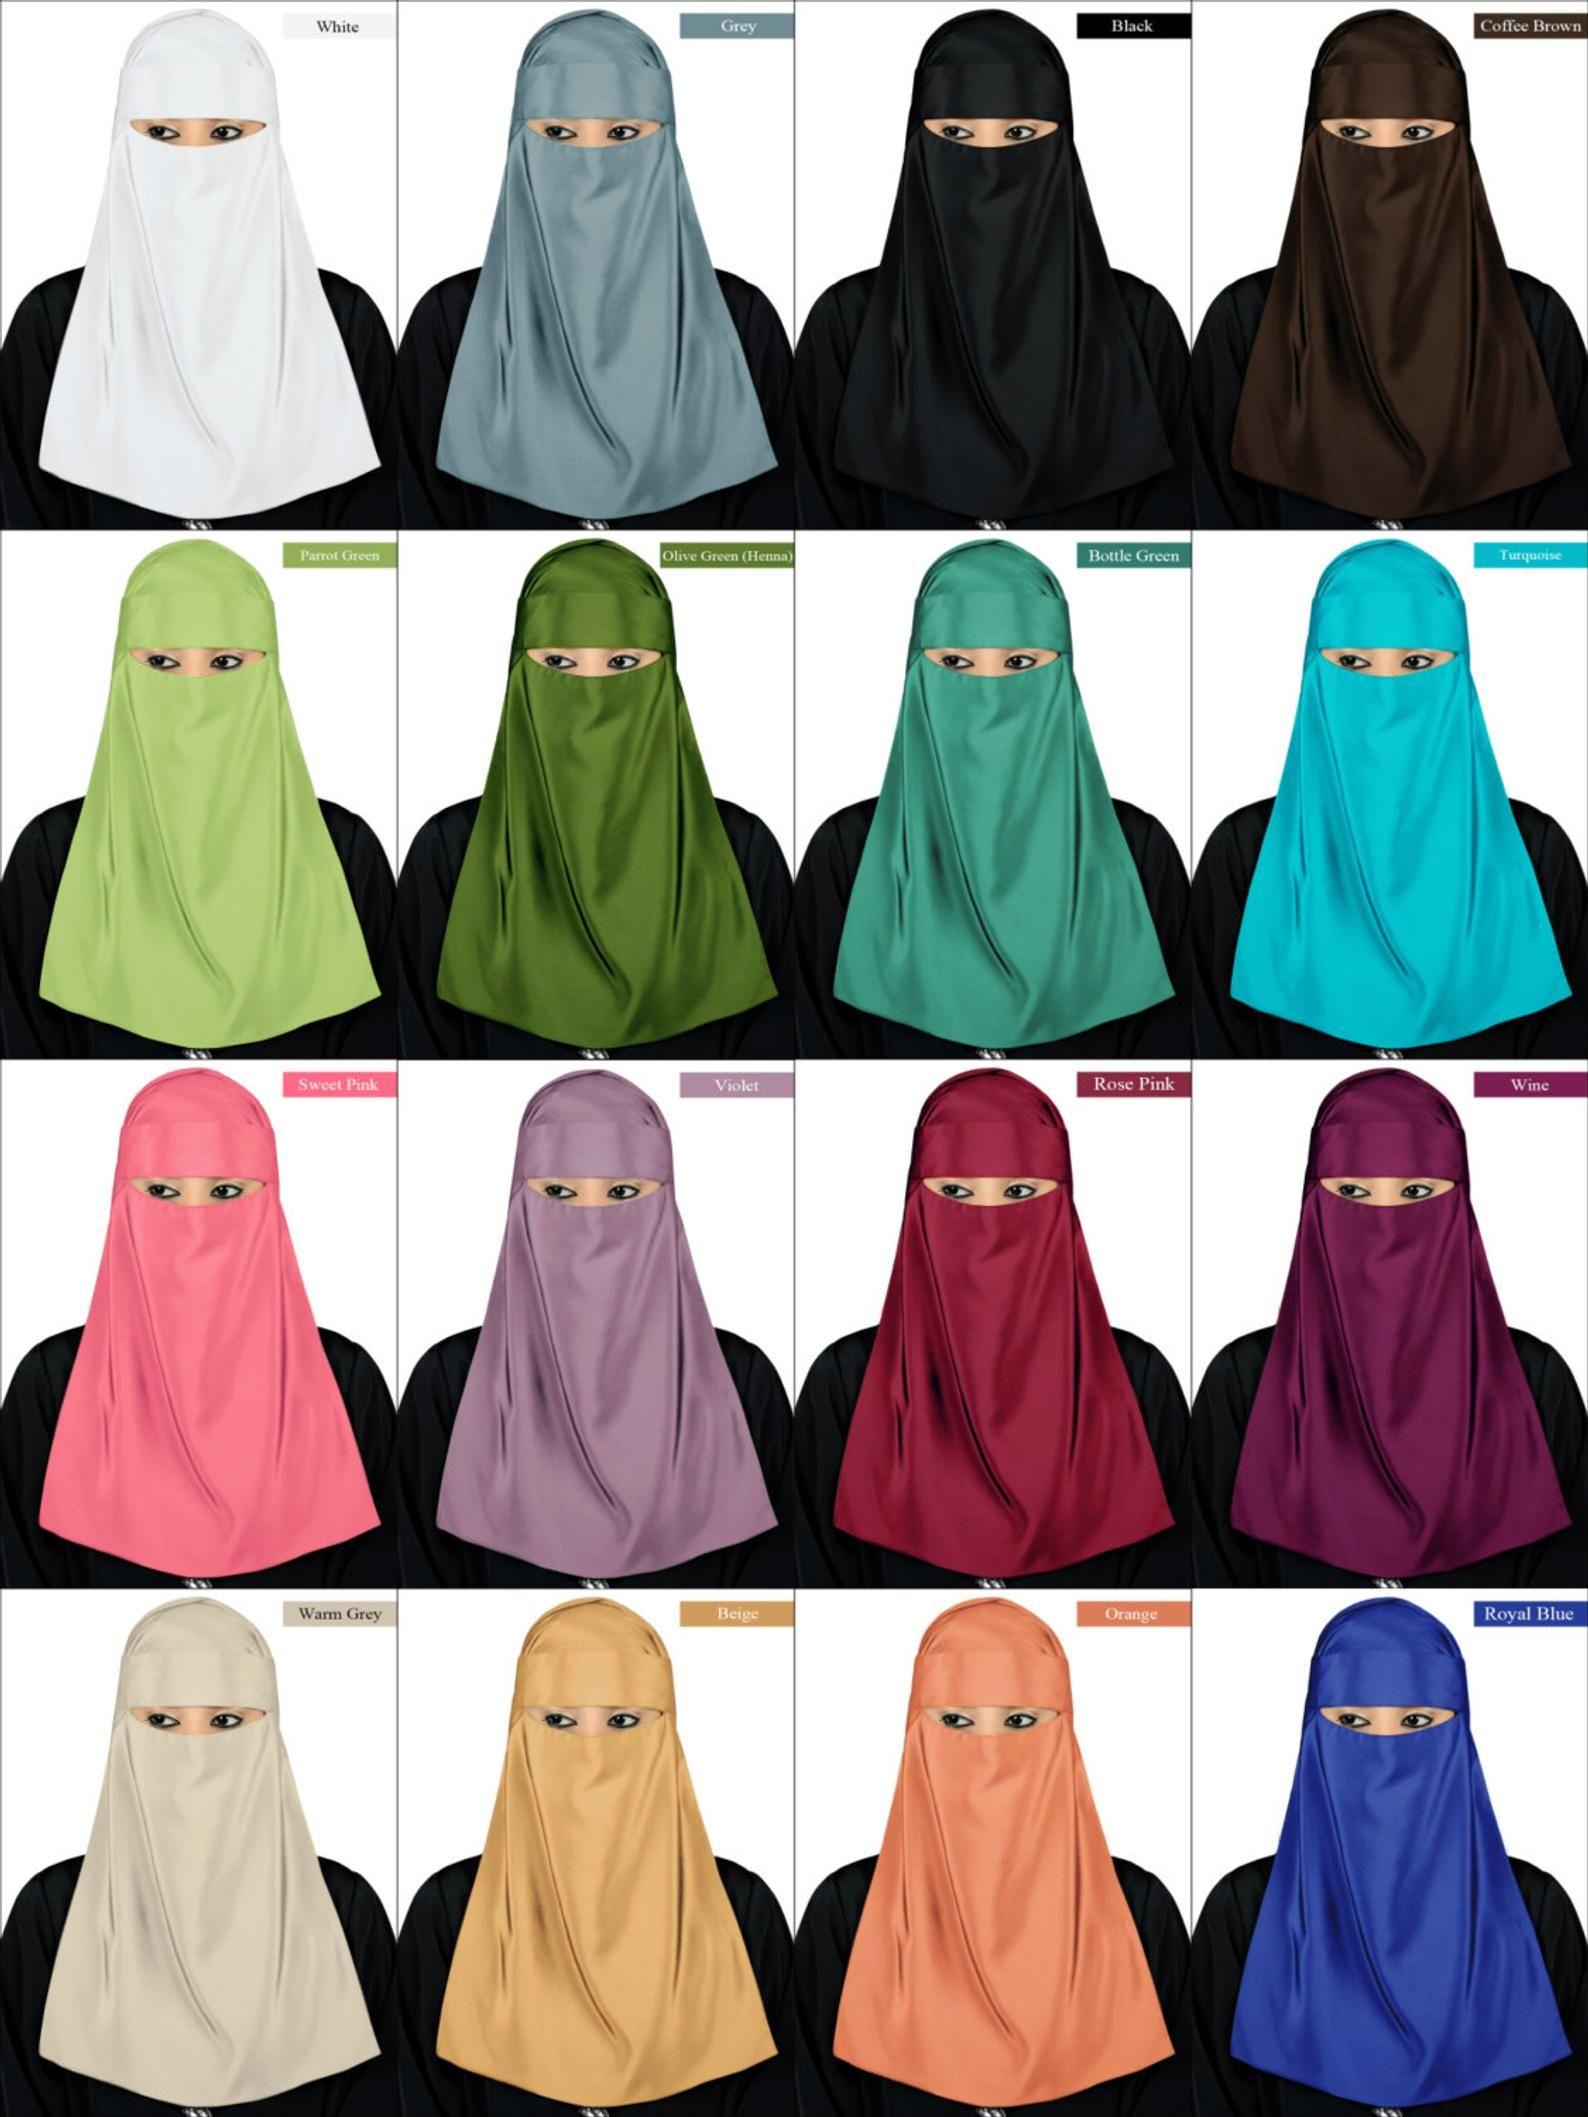 One Piece Muslim Women Wear Niqab Veil Ramadon  Arab Burka Burqa Full Hijab